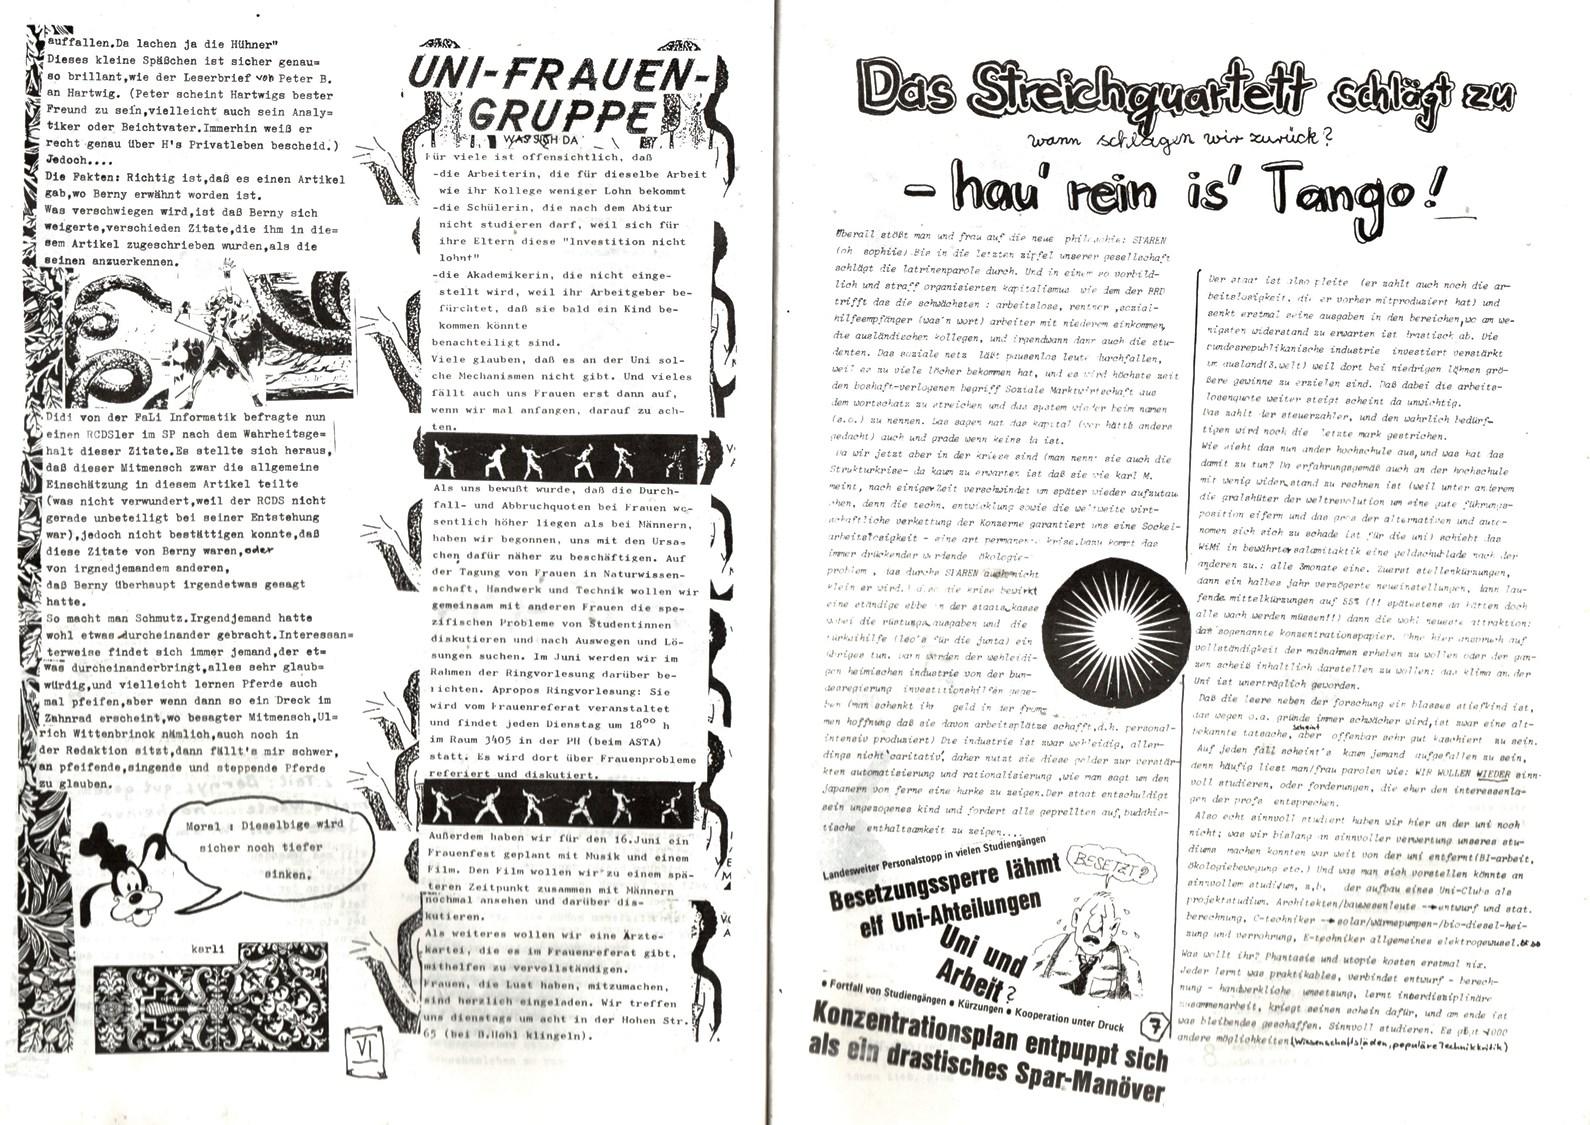 Dortmund_Uni_Spatz_19820600_004